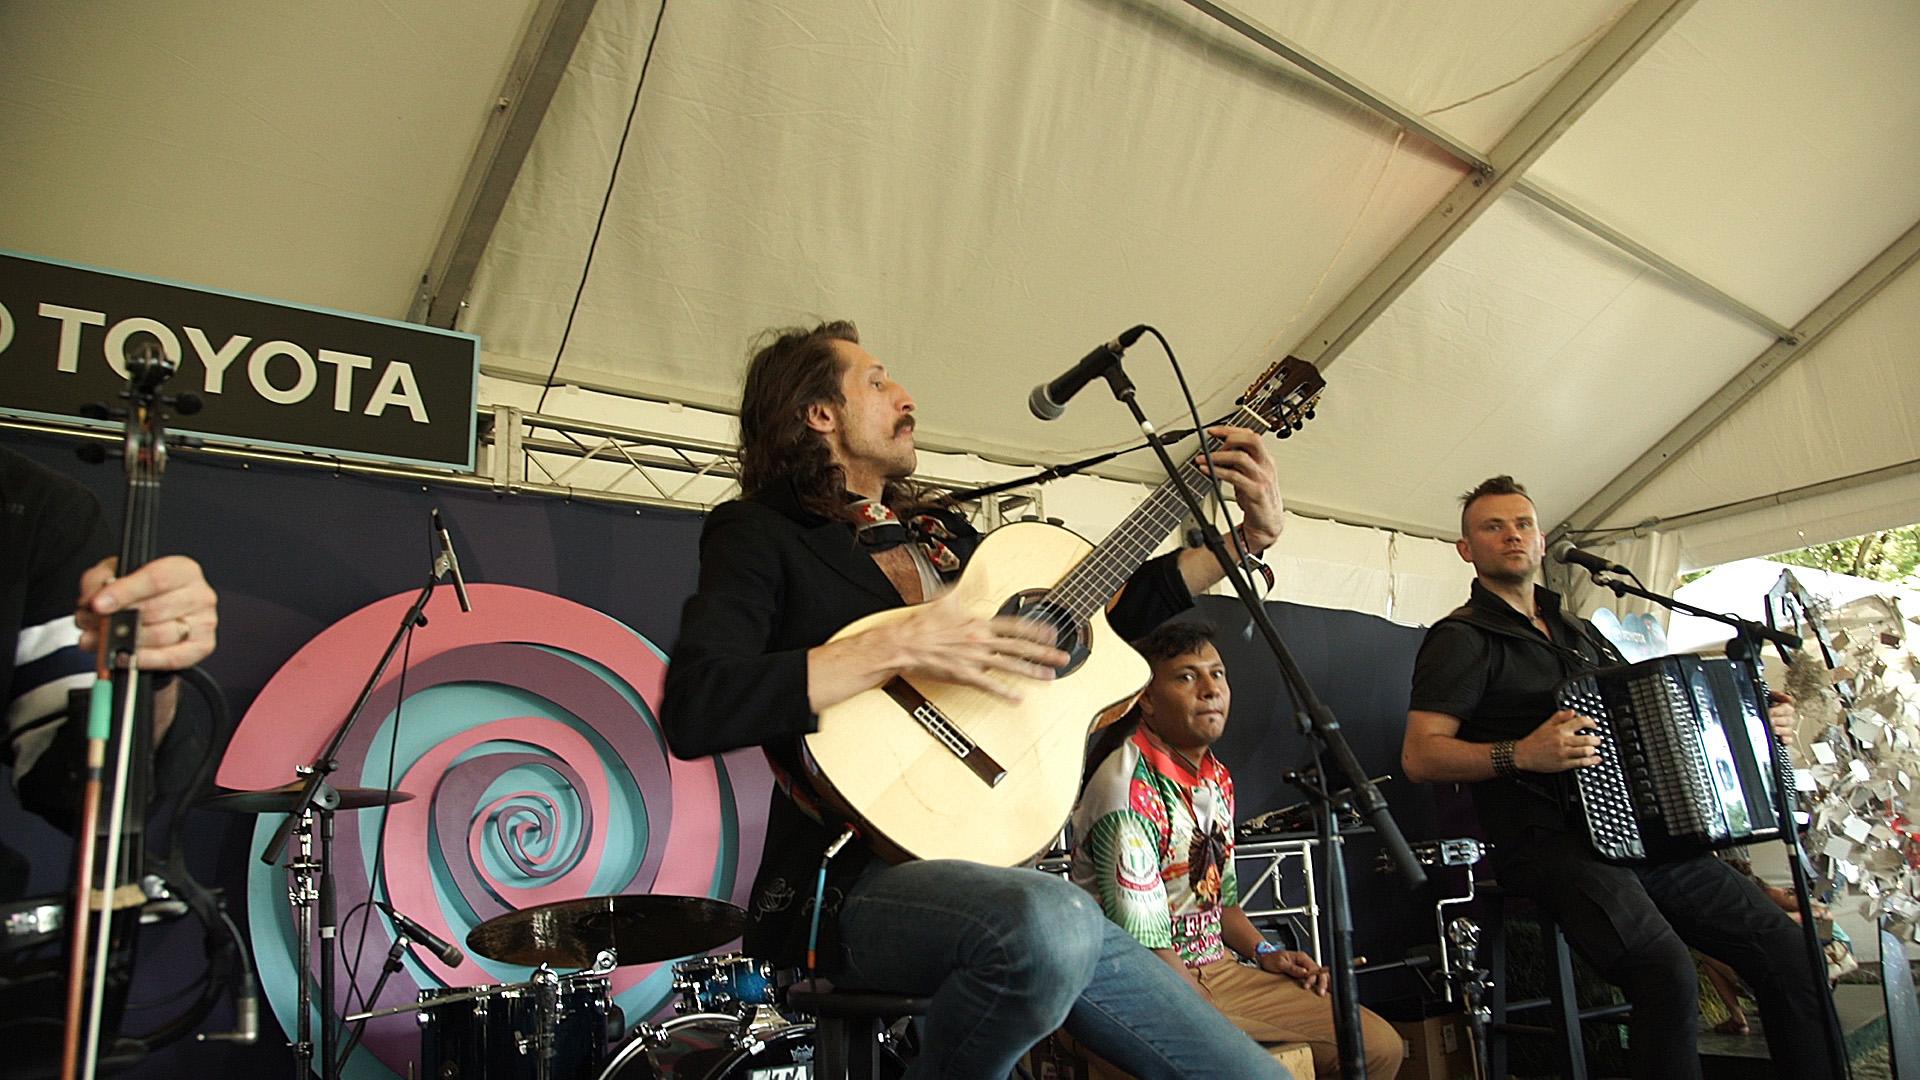 Gypsy punk band, Gogol Bordello, perform on Toyota stage